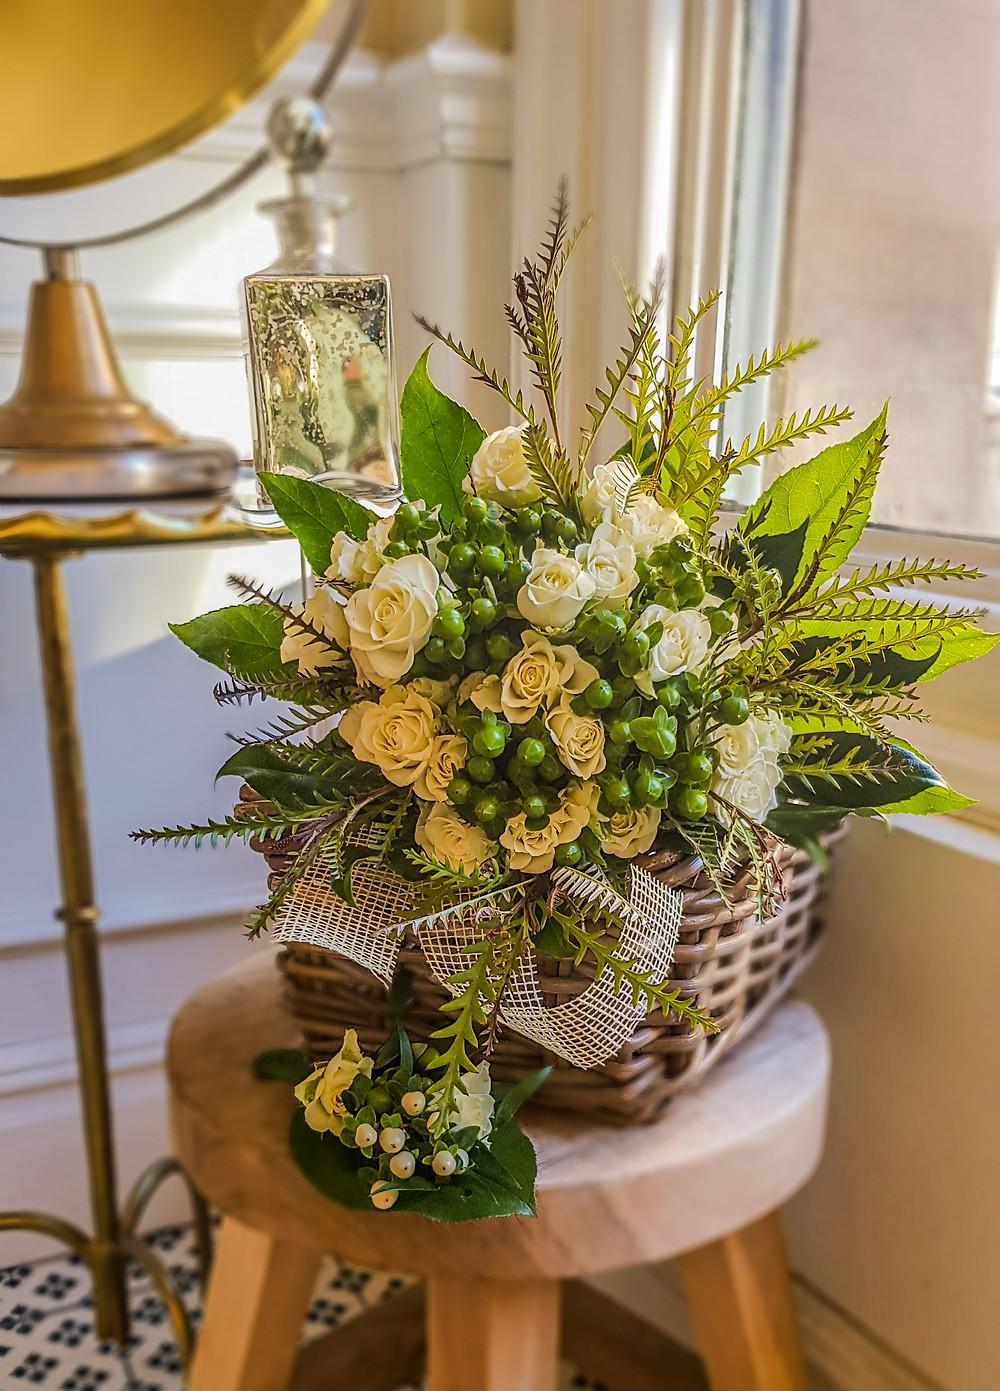 PC Creations Leeds Brides Bouquet containing 'Grevillea Ivanhoe' leaves